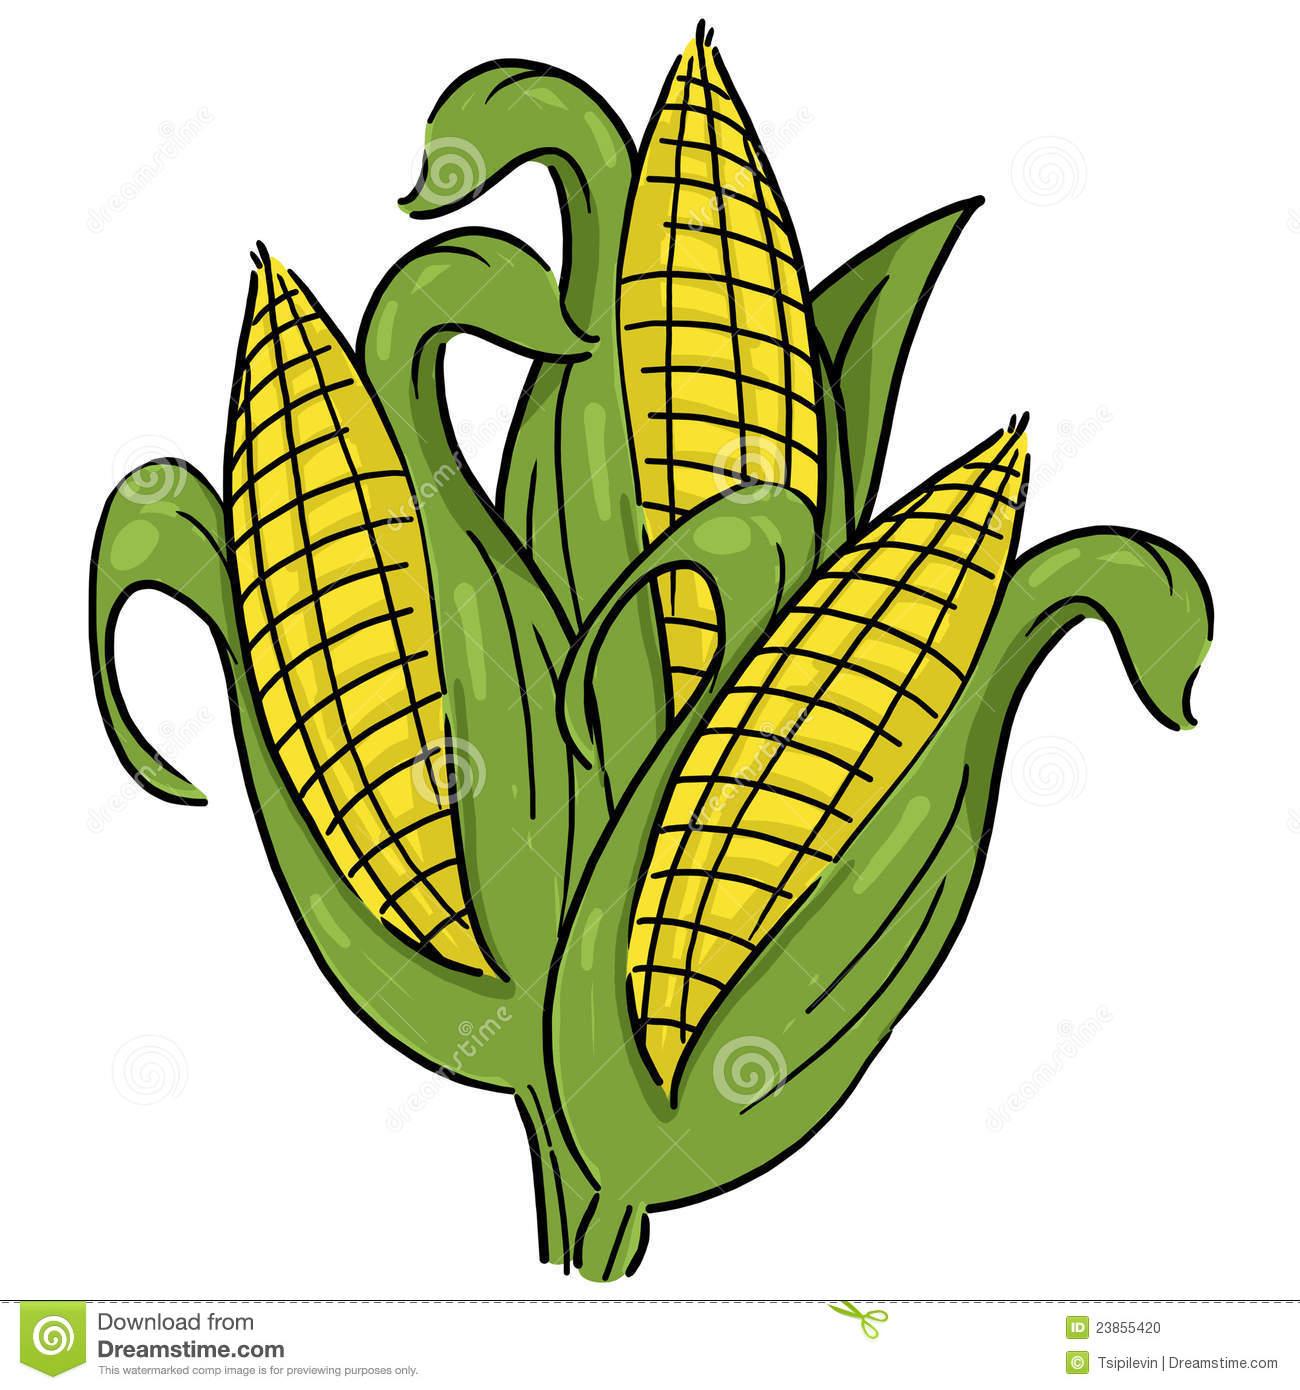 Corn Crops Clipart Ears Of Corn Illustra-Corn Crops Clipart Ears Of Corn Illustration-12